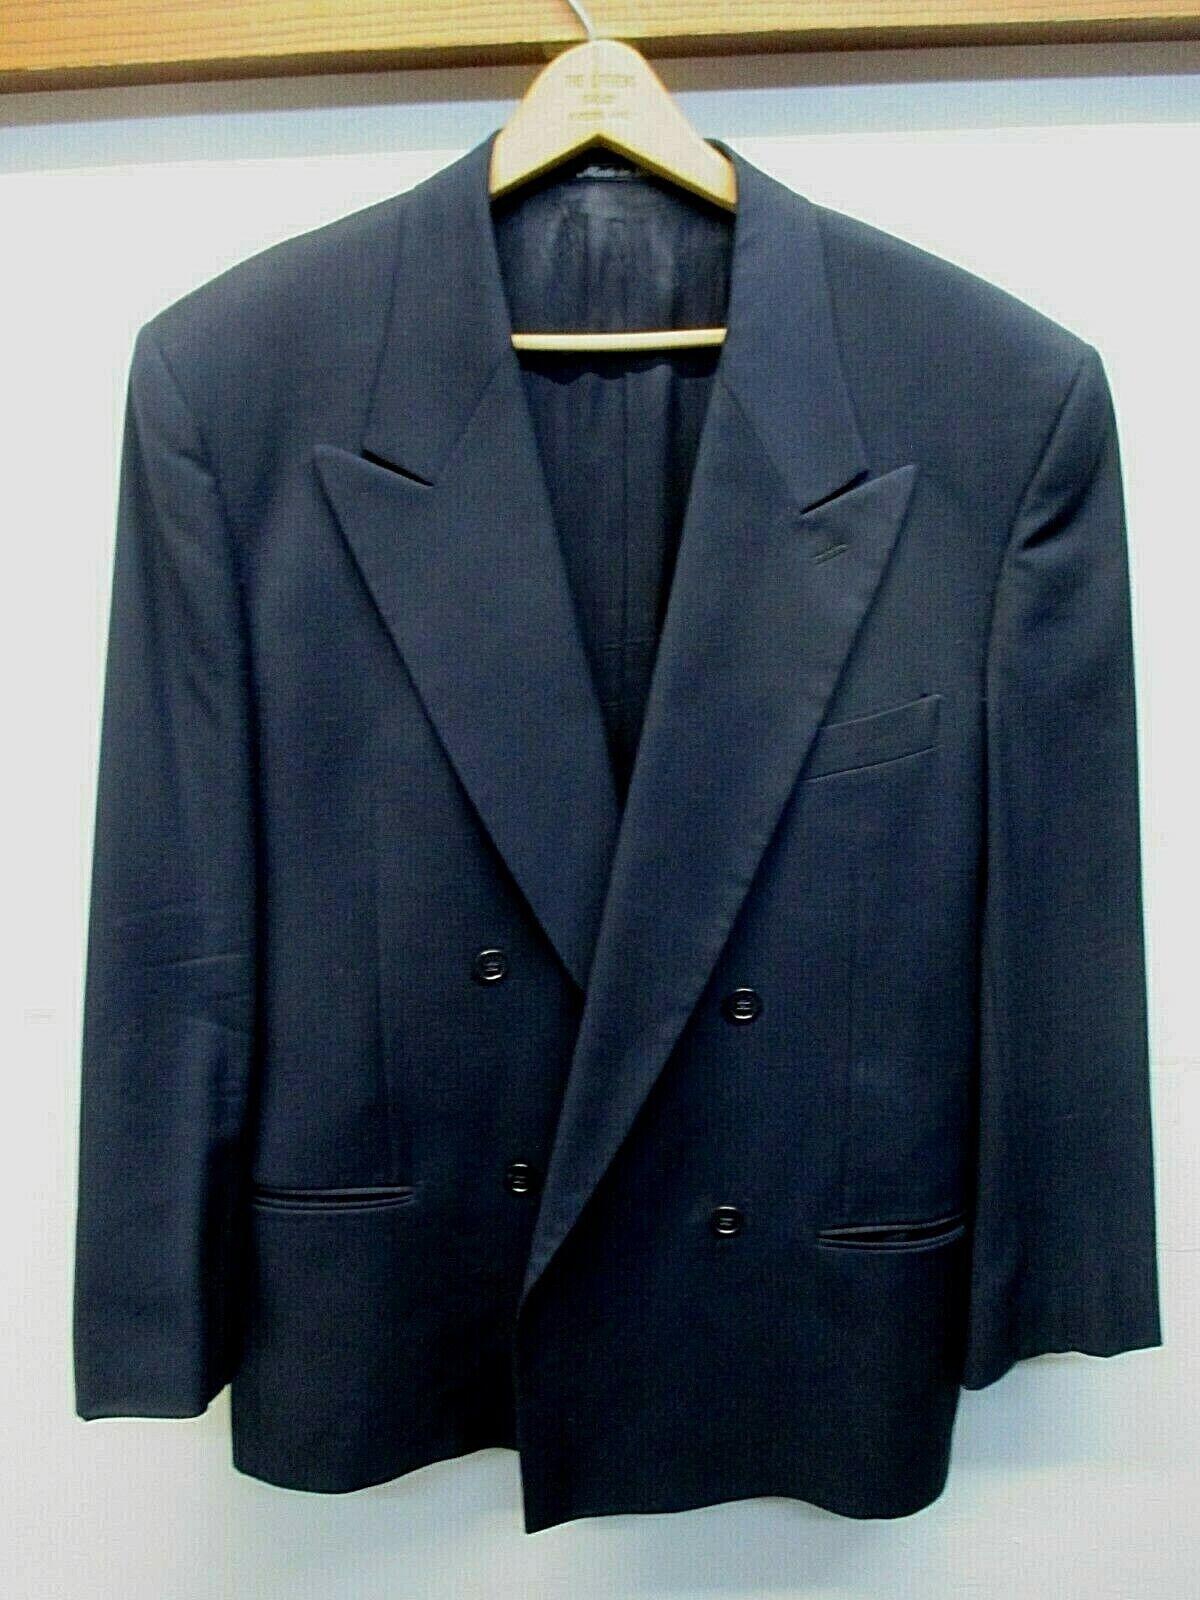 EUC  Men's Suit 40R Giorgio Armani Wool Peak lapel Vtg Double Breasted Navy bluee